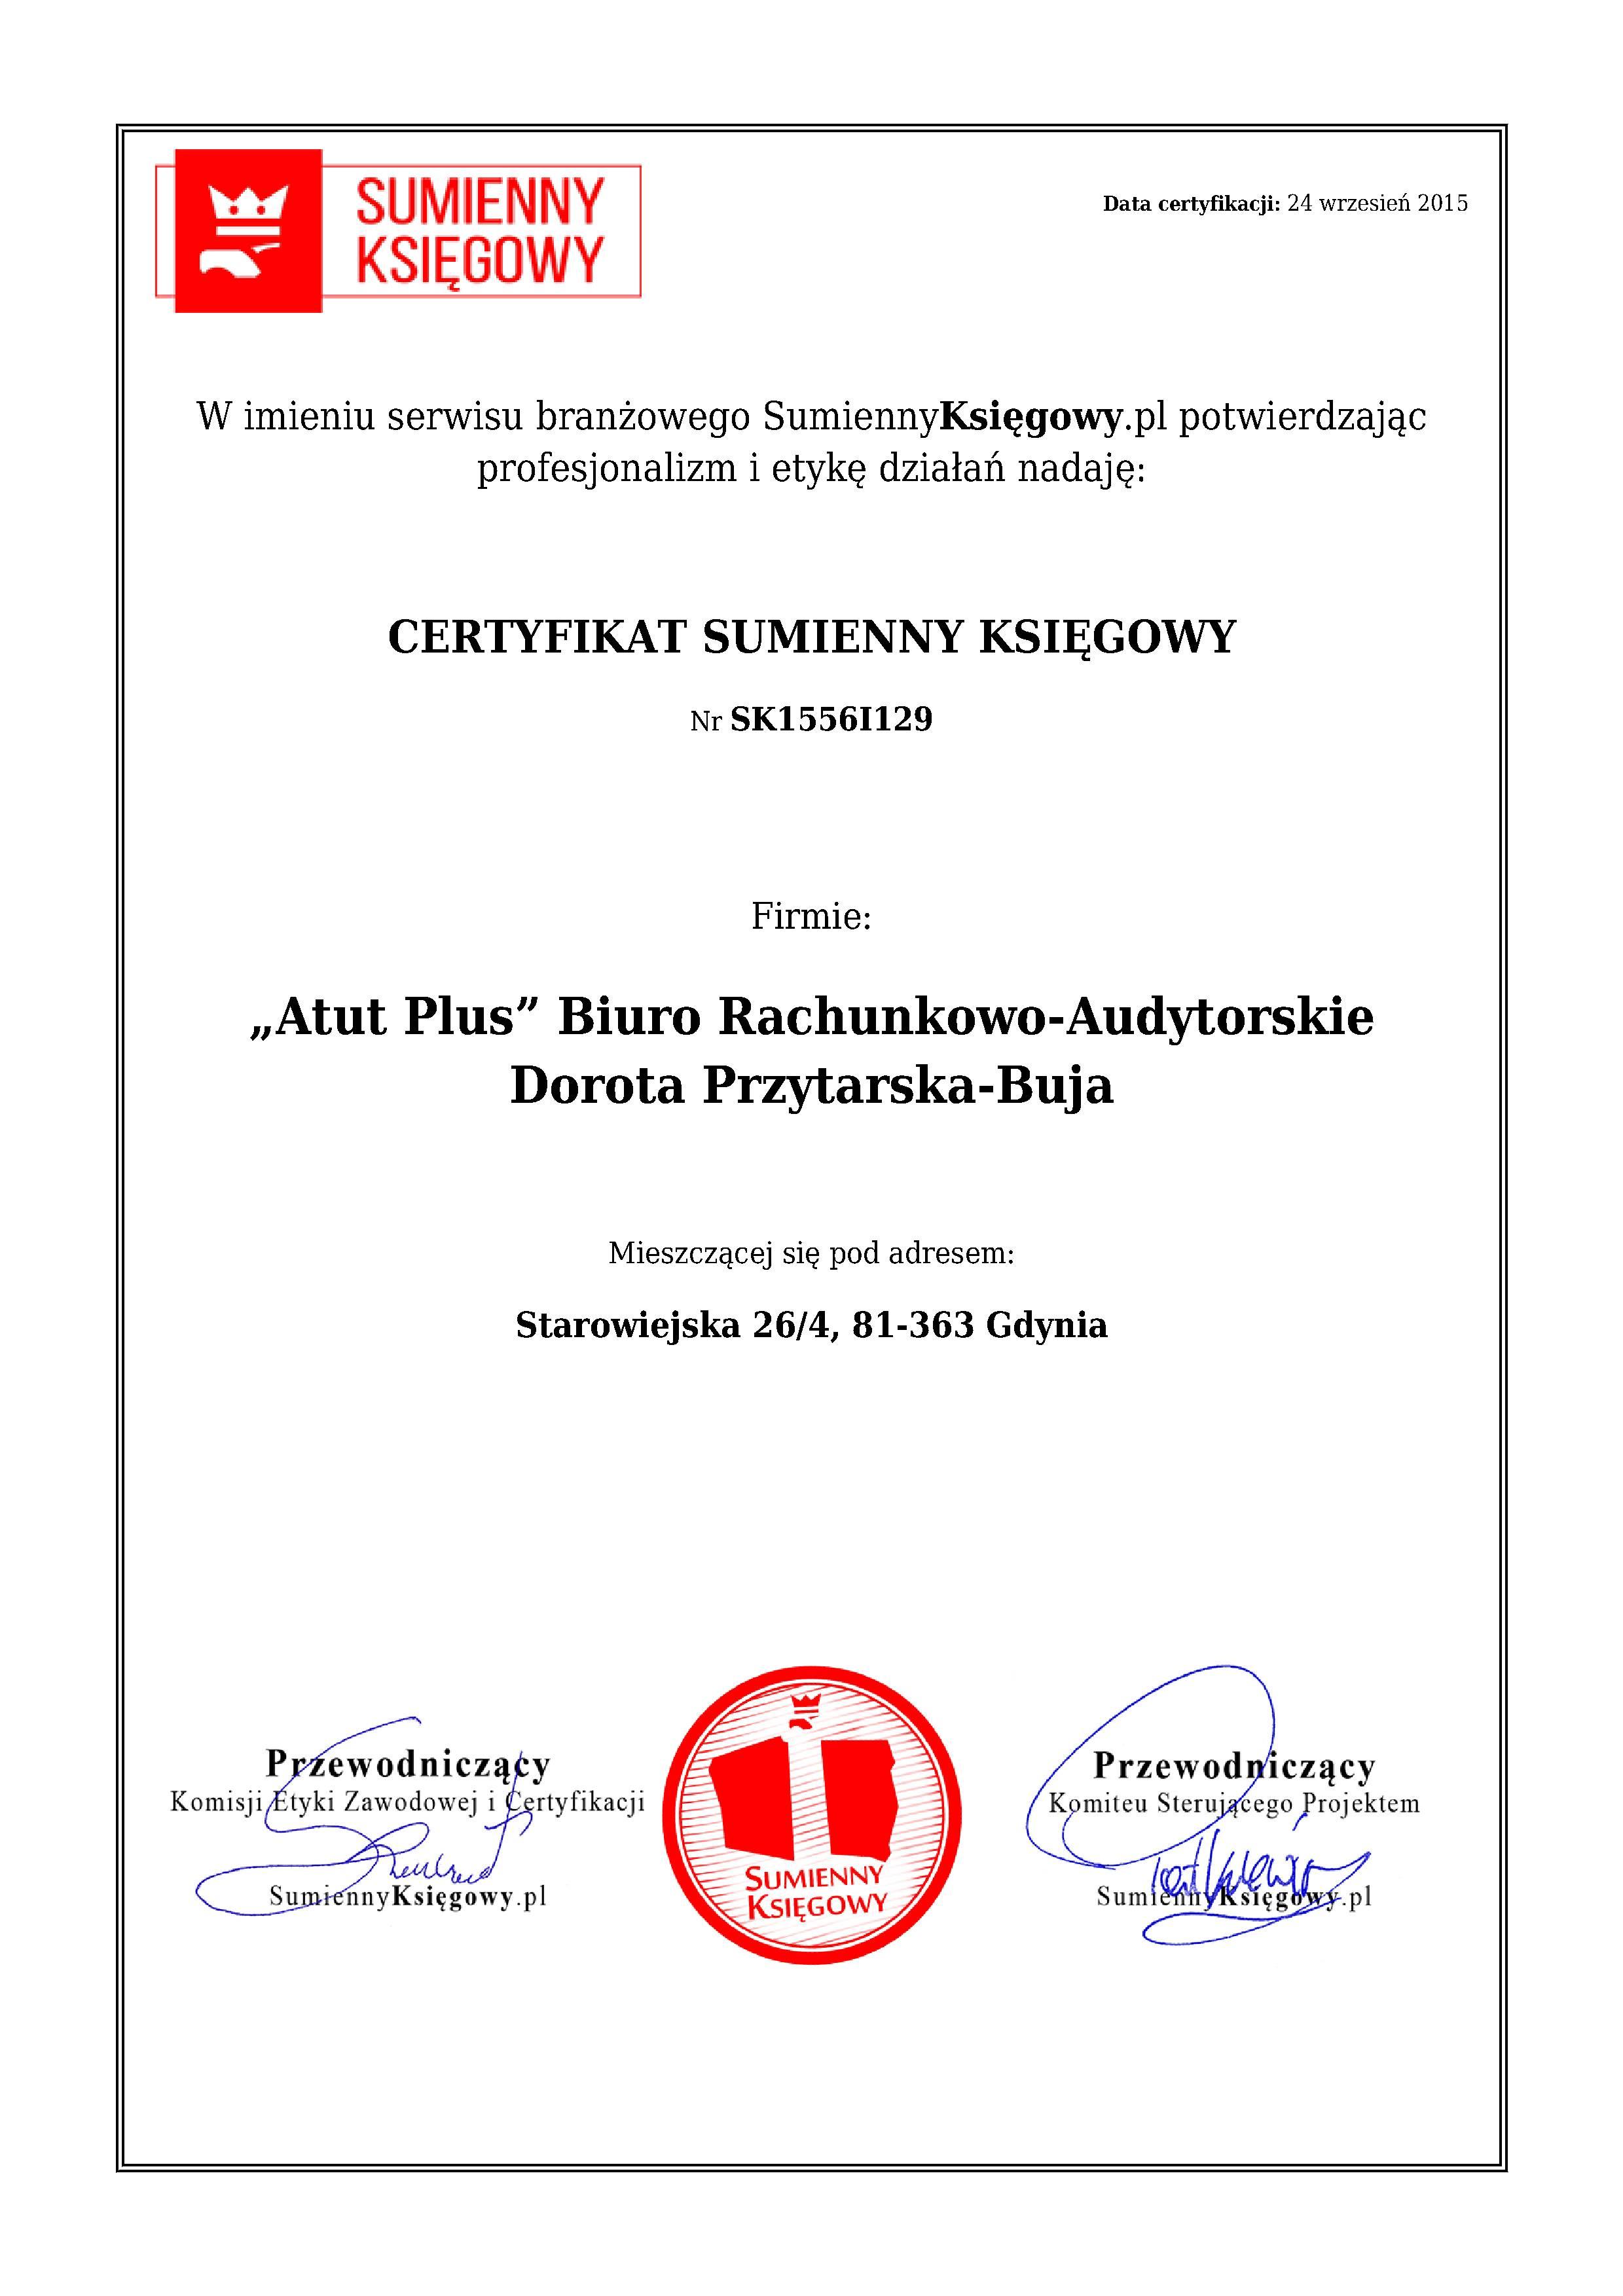 "Certyfikat ""Atut Plus"" Biuro Rachunkowo-Audytorskie, Dorota Przytarska-Buja"